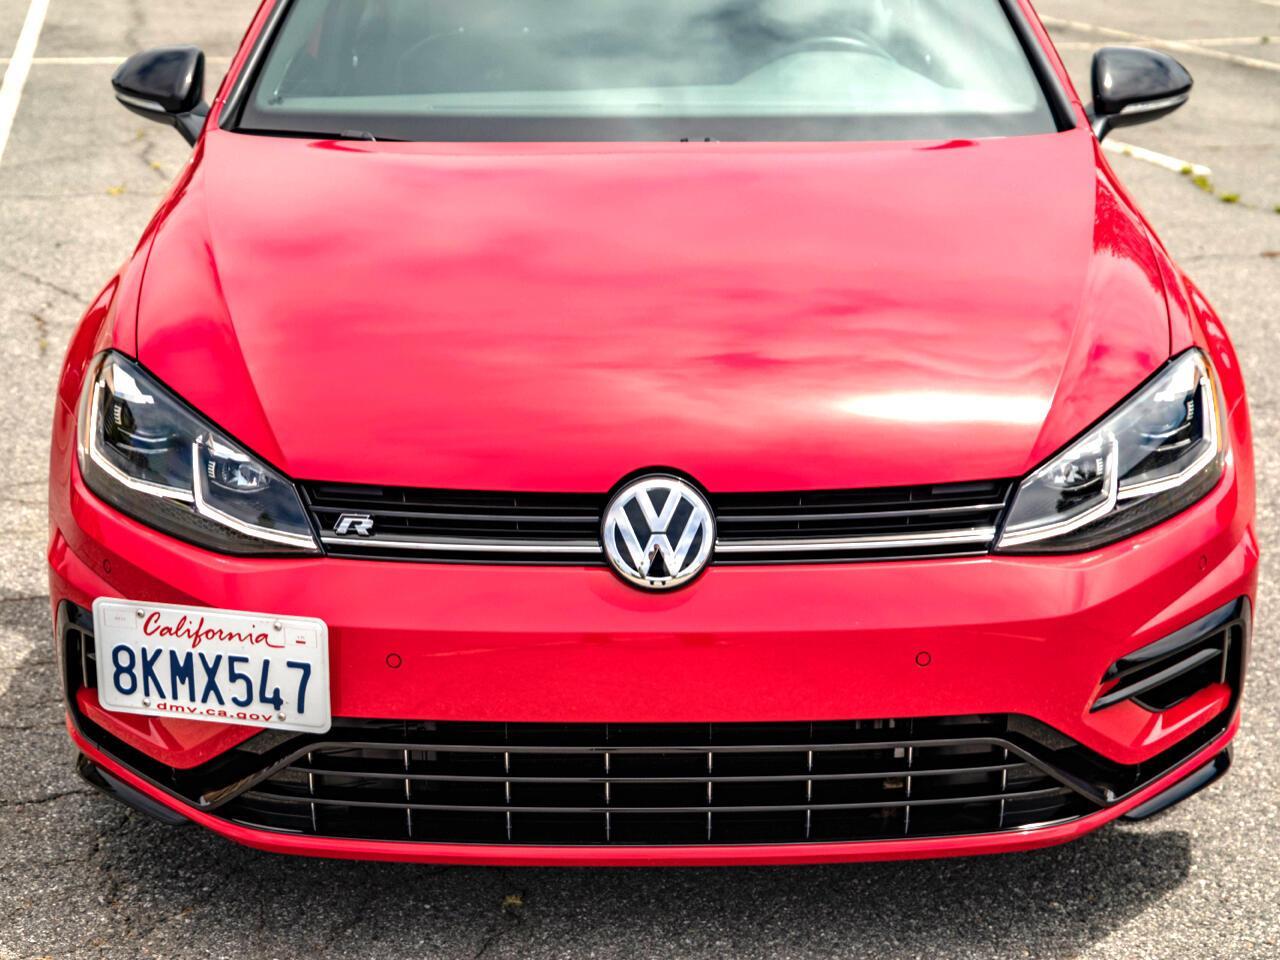 2019 Volkswagen Golf (CC-1376720) for sale in Marina Del Rey, California